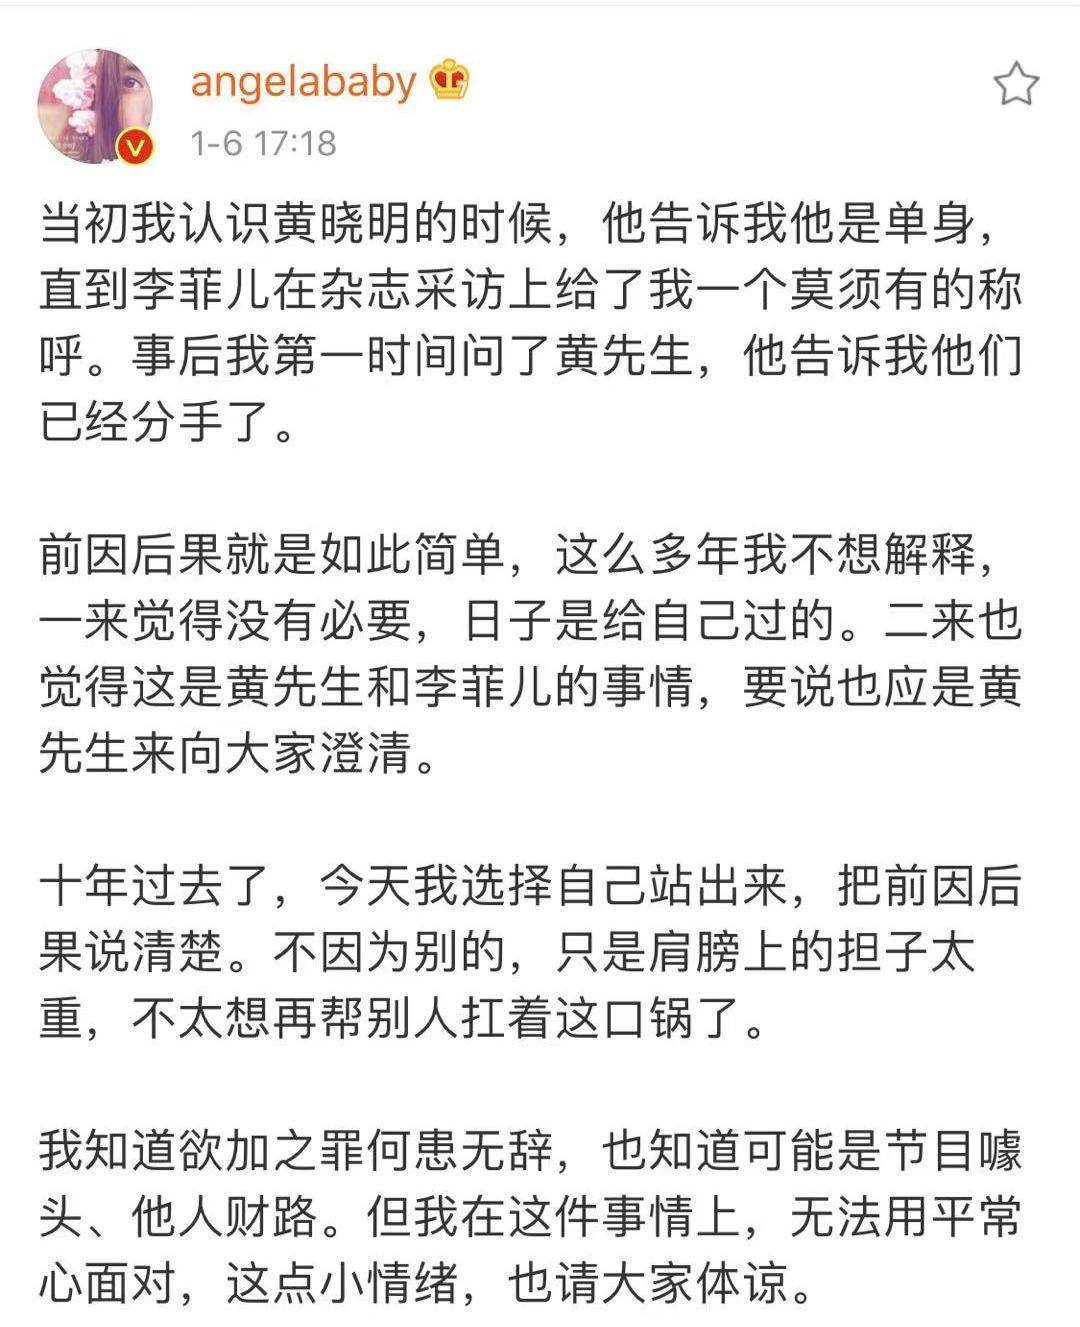 Baby控诉遭李菲儿冤枉十年,黄晓明的回应竟是两者都不得罪